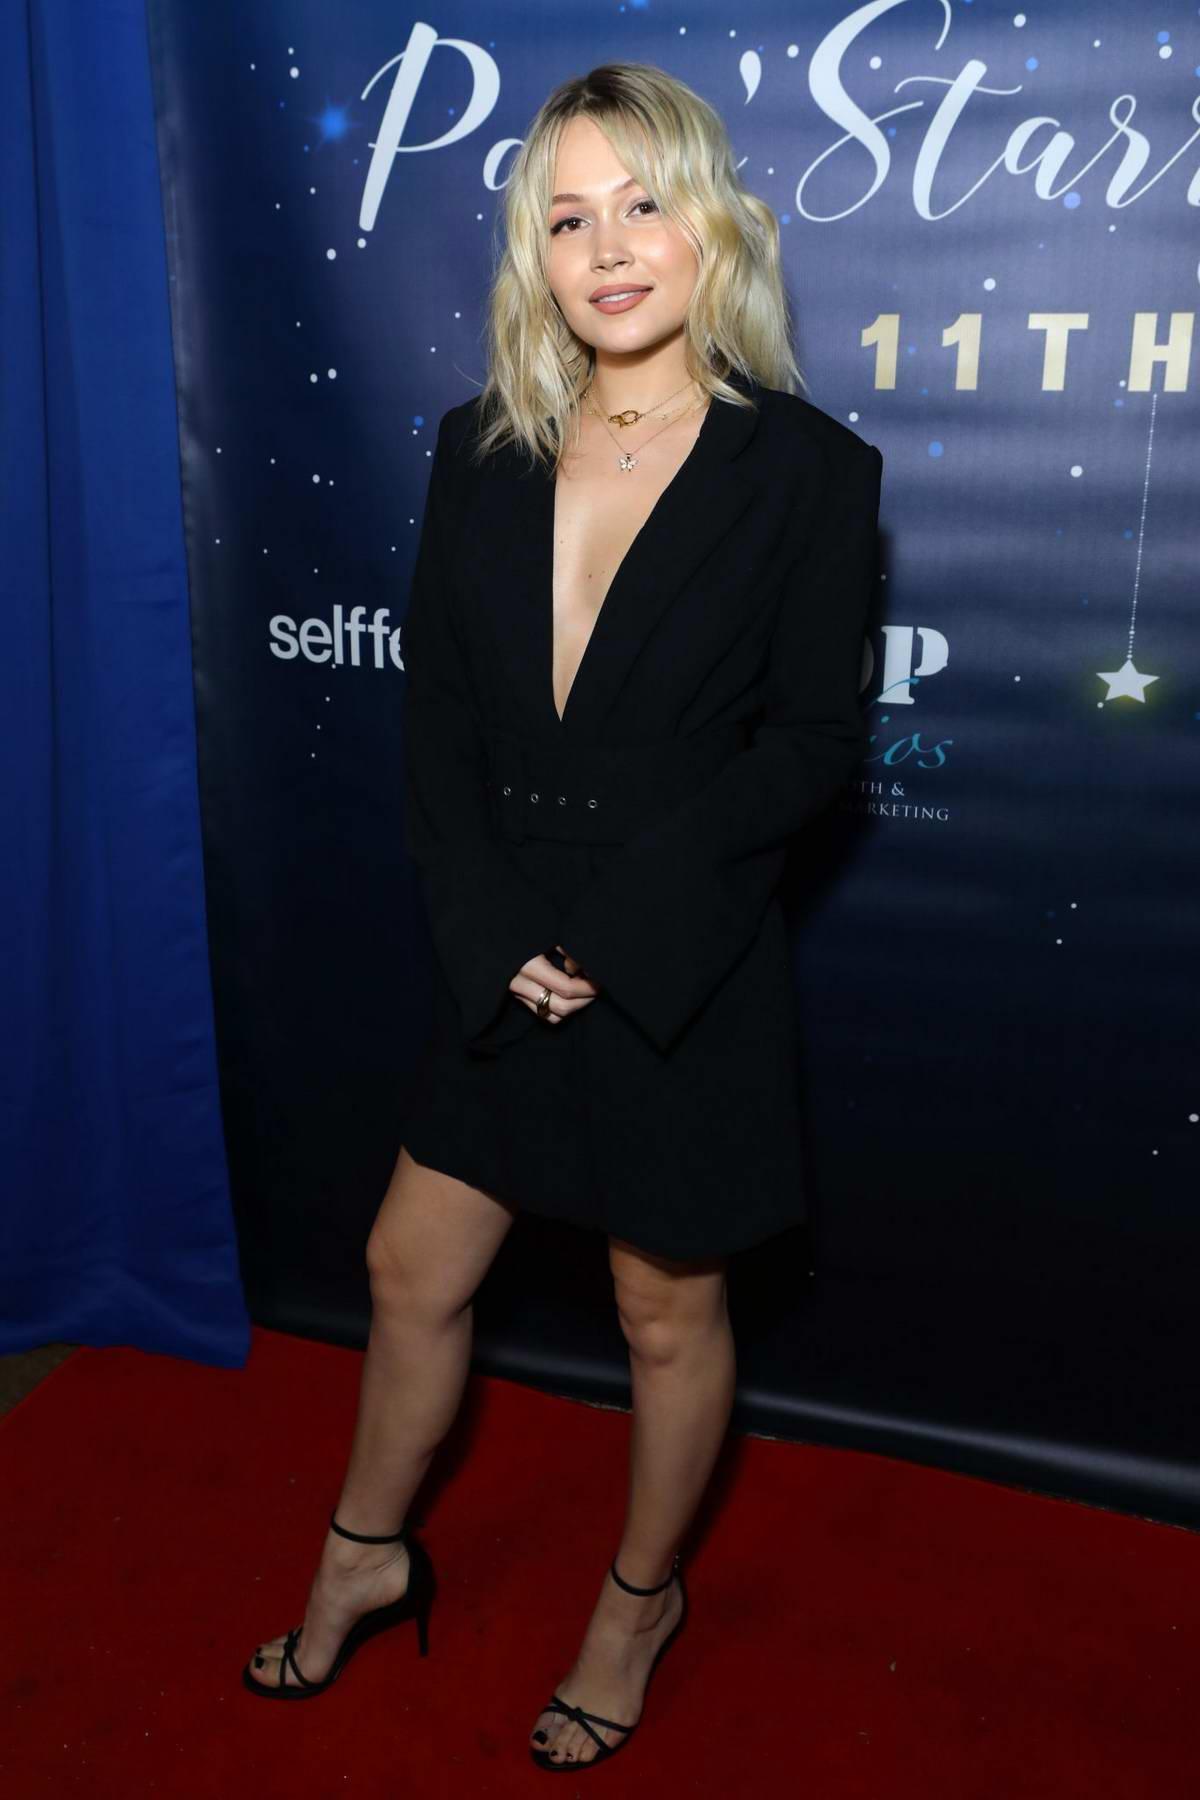 Kelli Berglund attends Paris Berelc's 21st Birthday Party at the Hideaway in Los Angeles